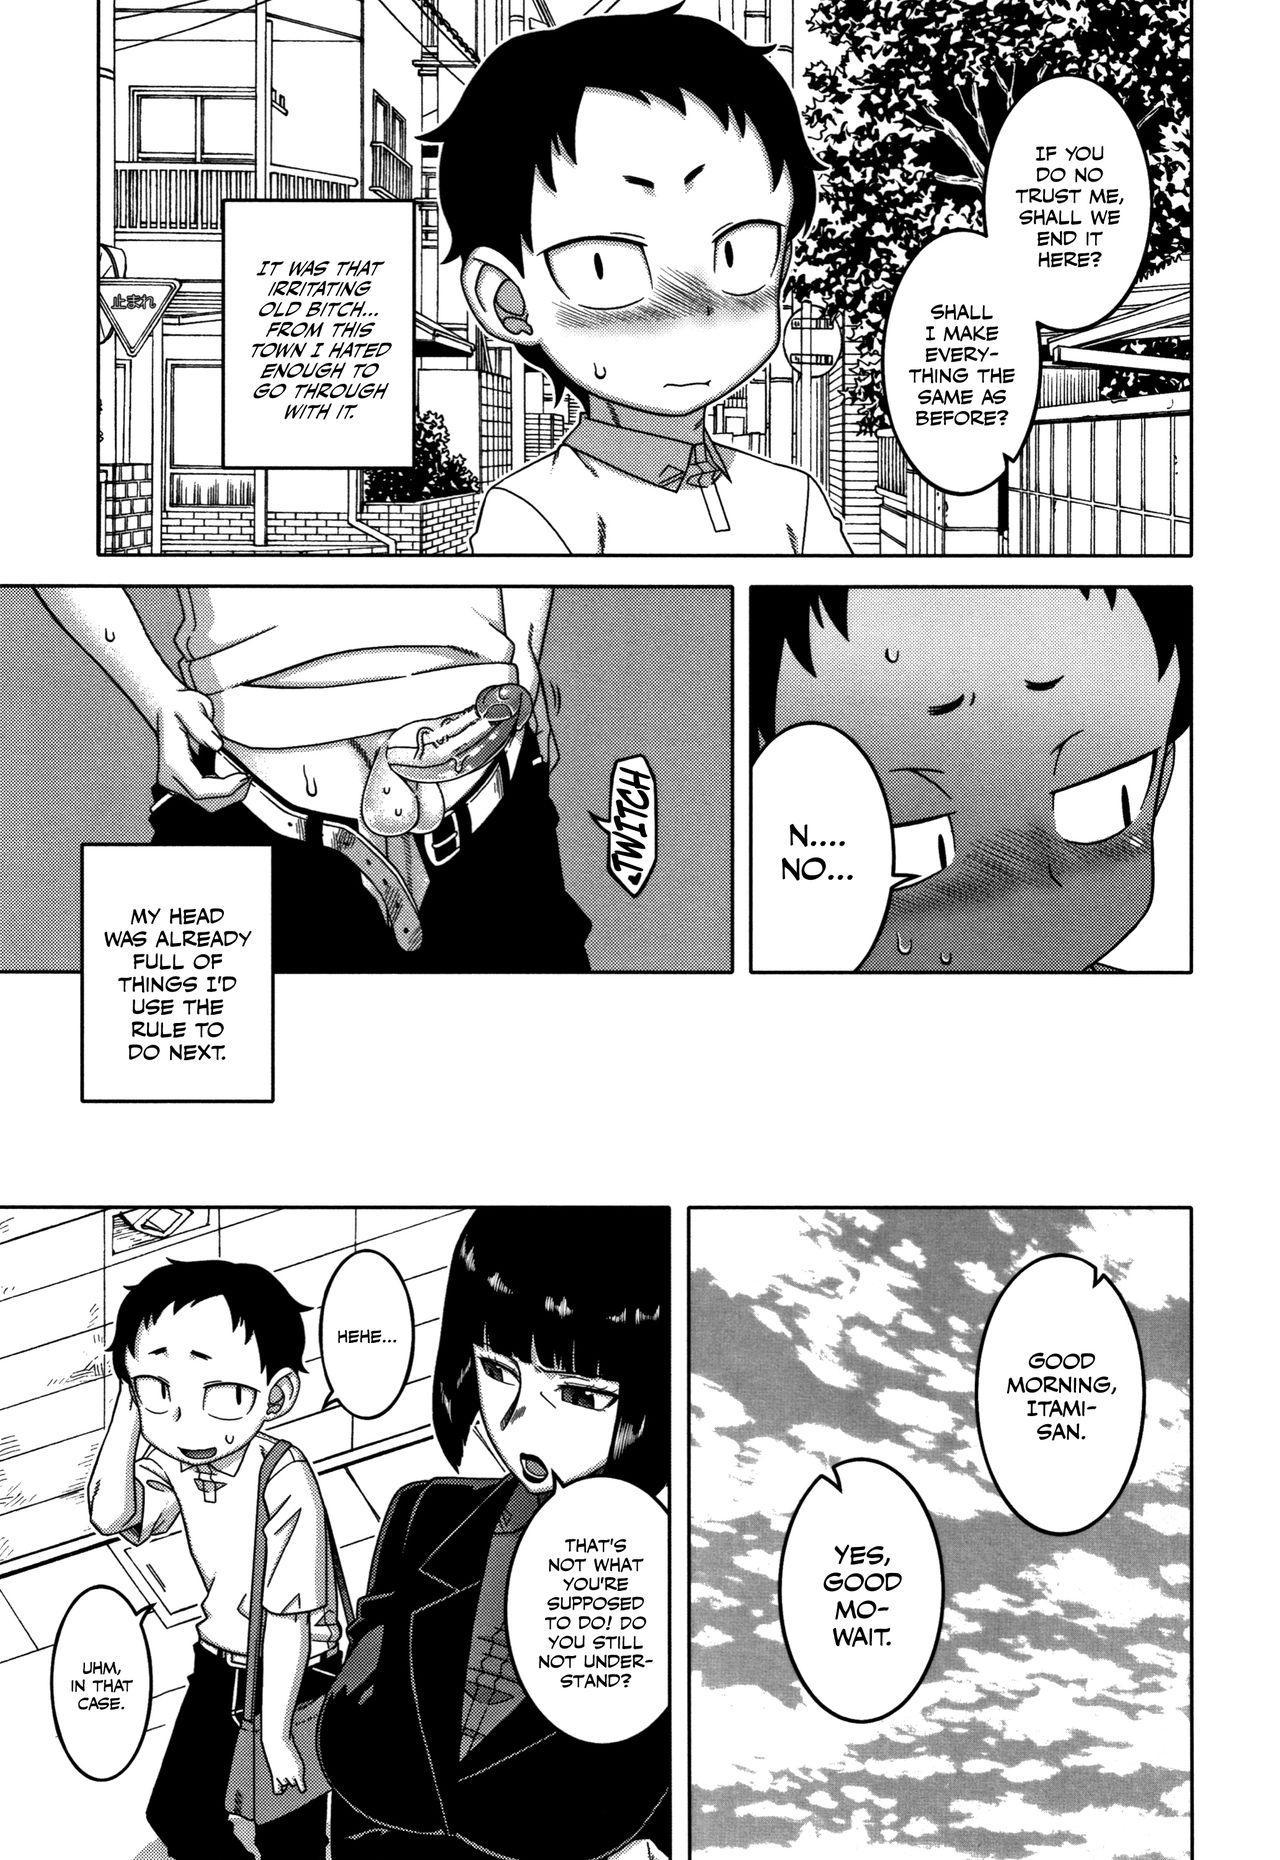 [Takatsu] Kami-sama no Iu Toori   As God Says Ch. 1-2 [English] [Secluded] 12